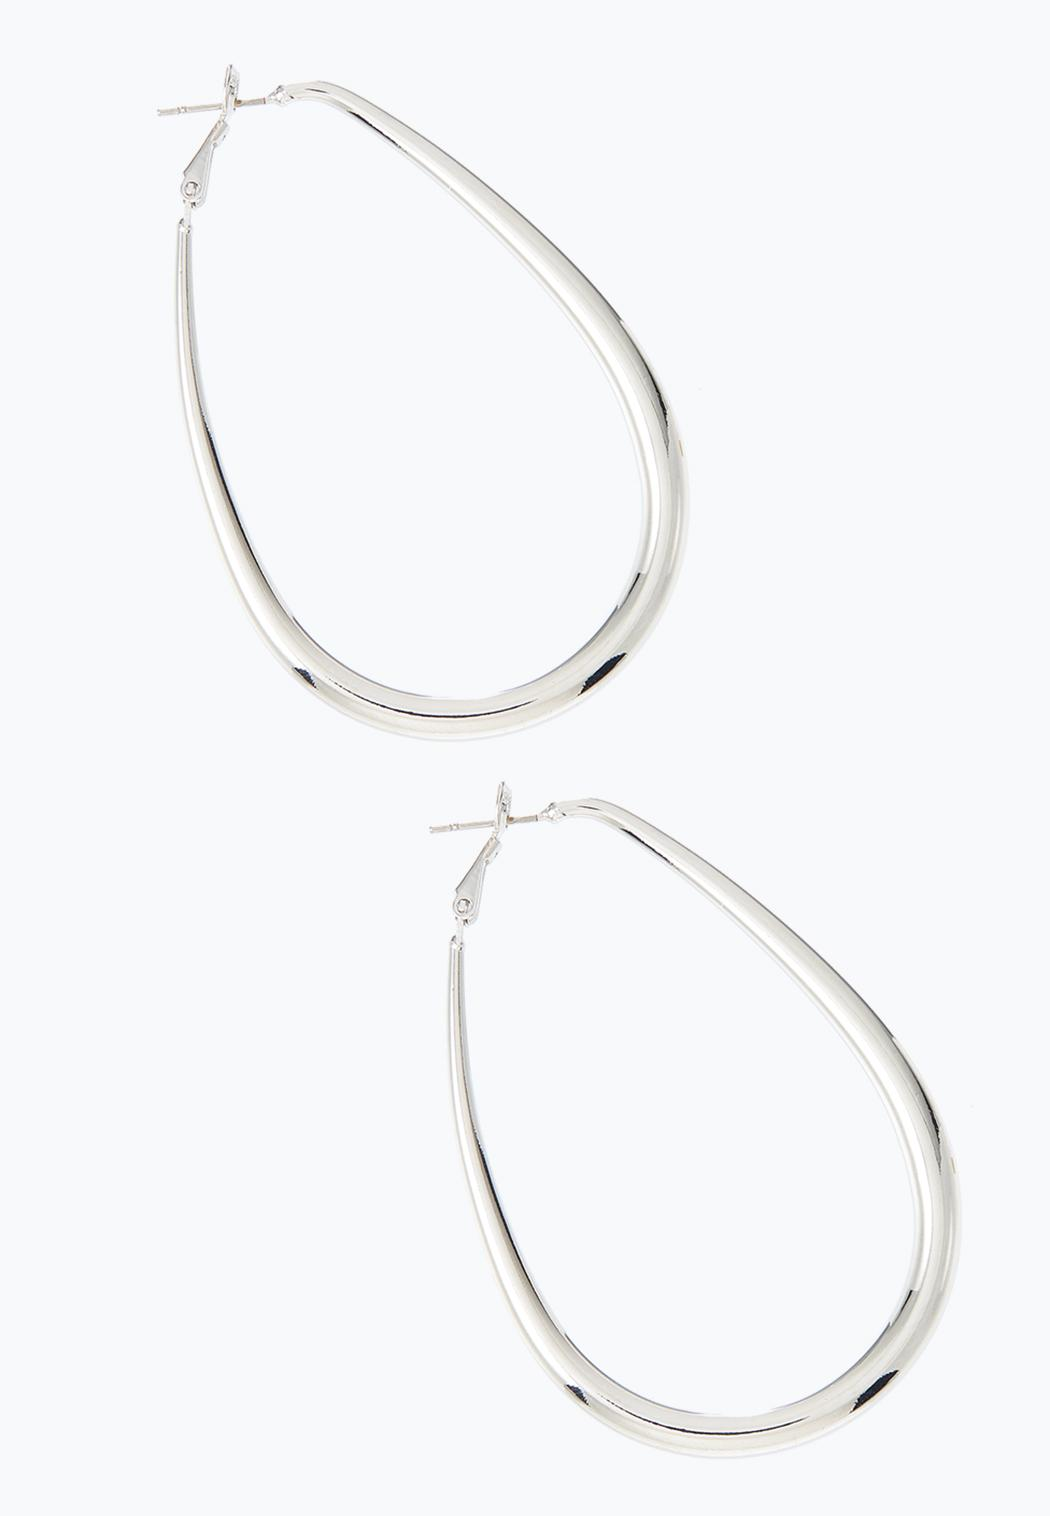 Tubular Oval Hoop Earrings